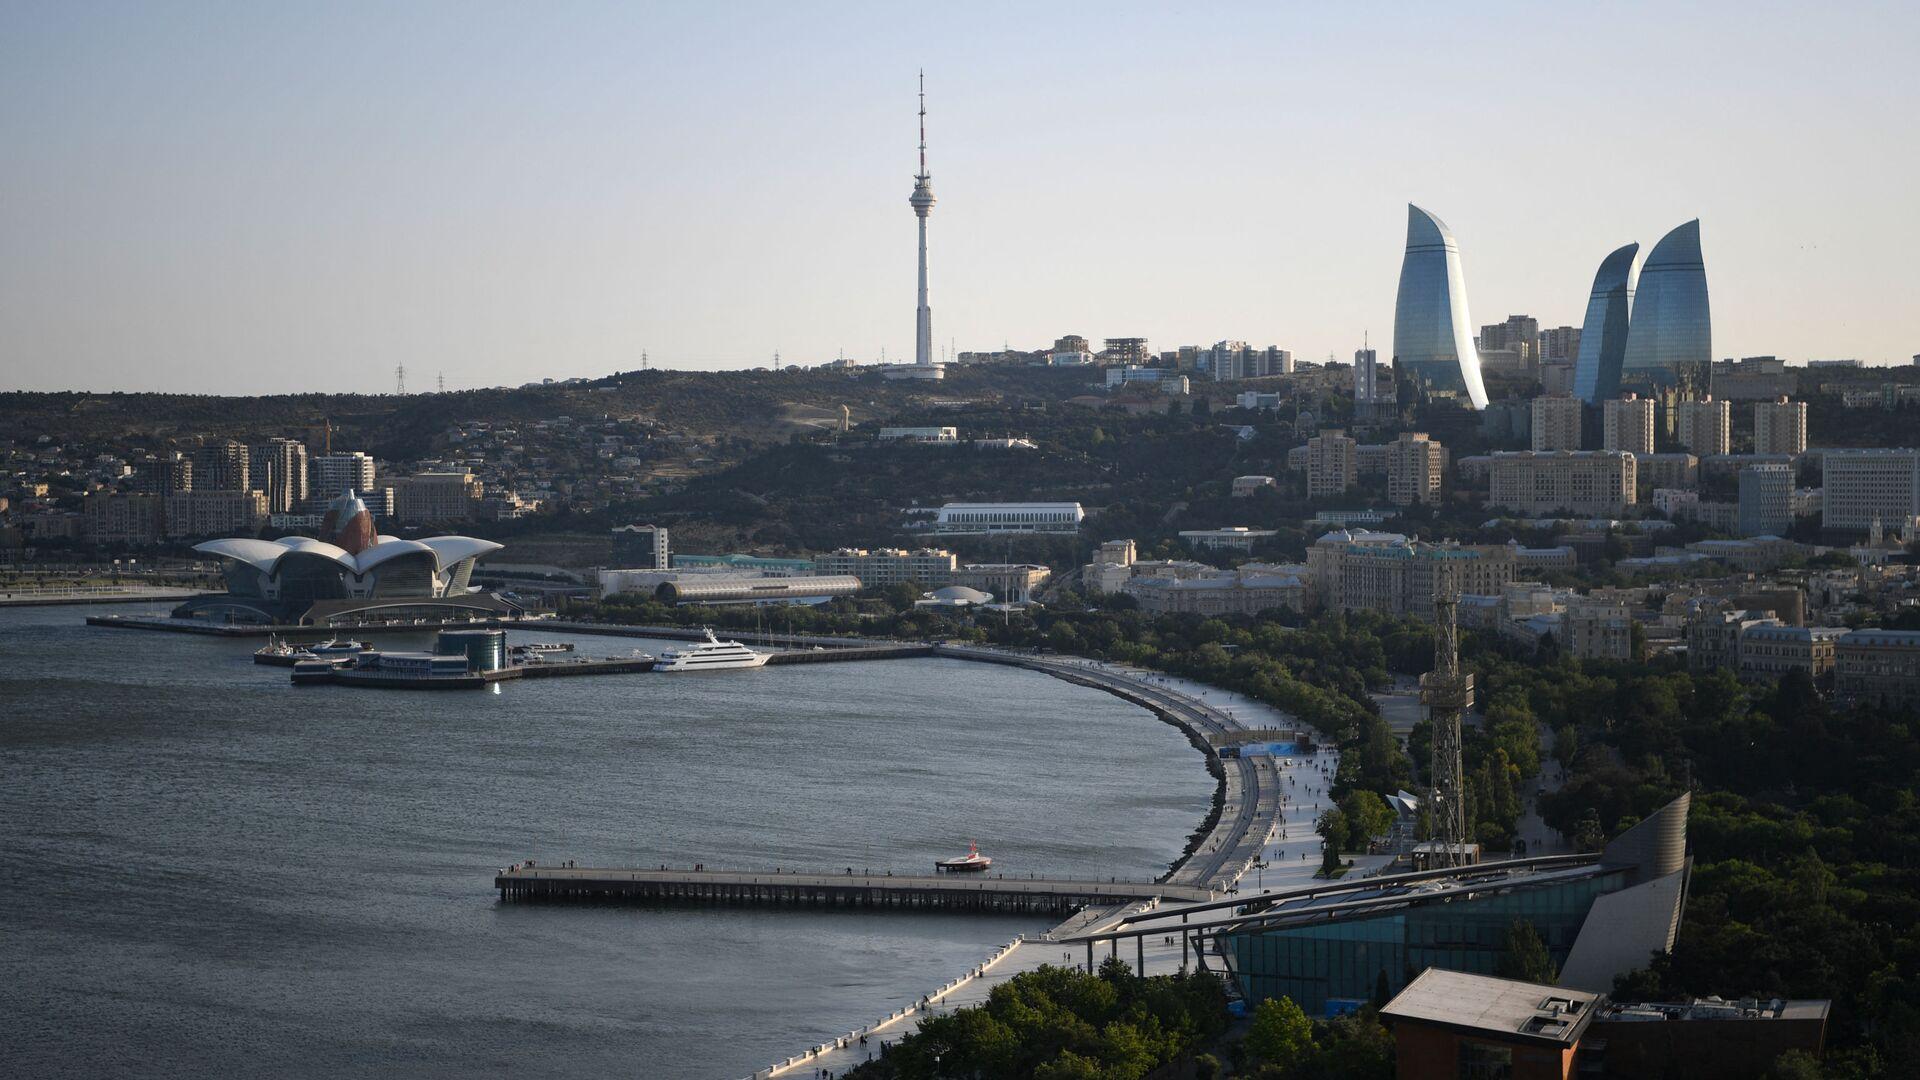 Вид на Flame Towers (Пламенные башни) в Баку, фото из архива - Sputnik Азербайджан, 1920, 09.07.2021